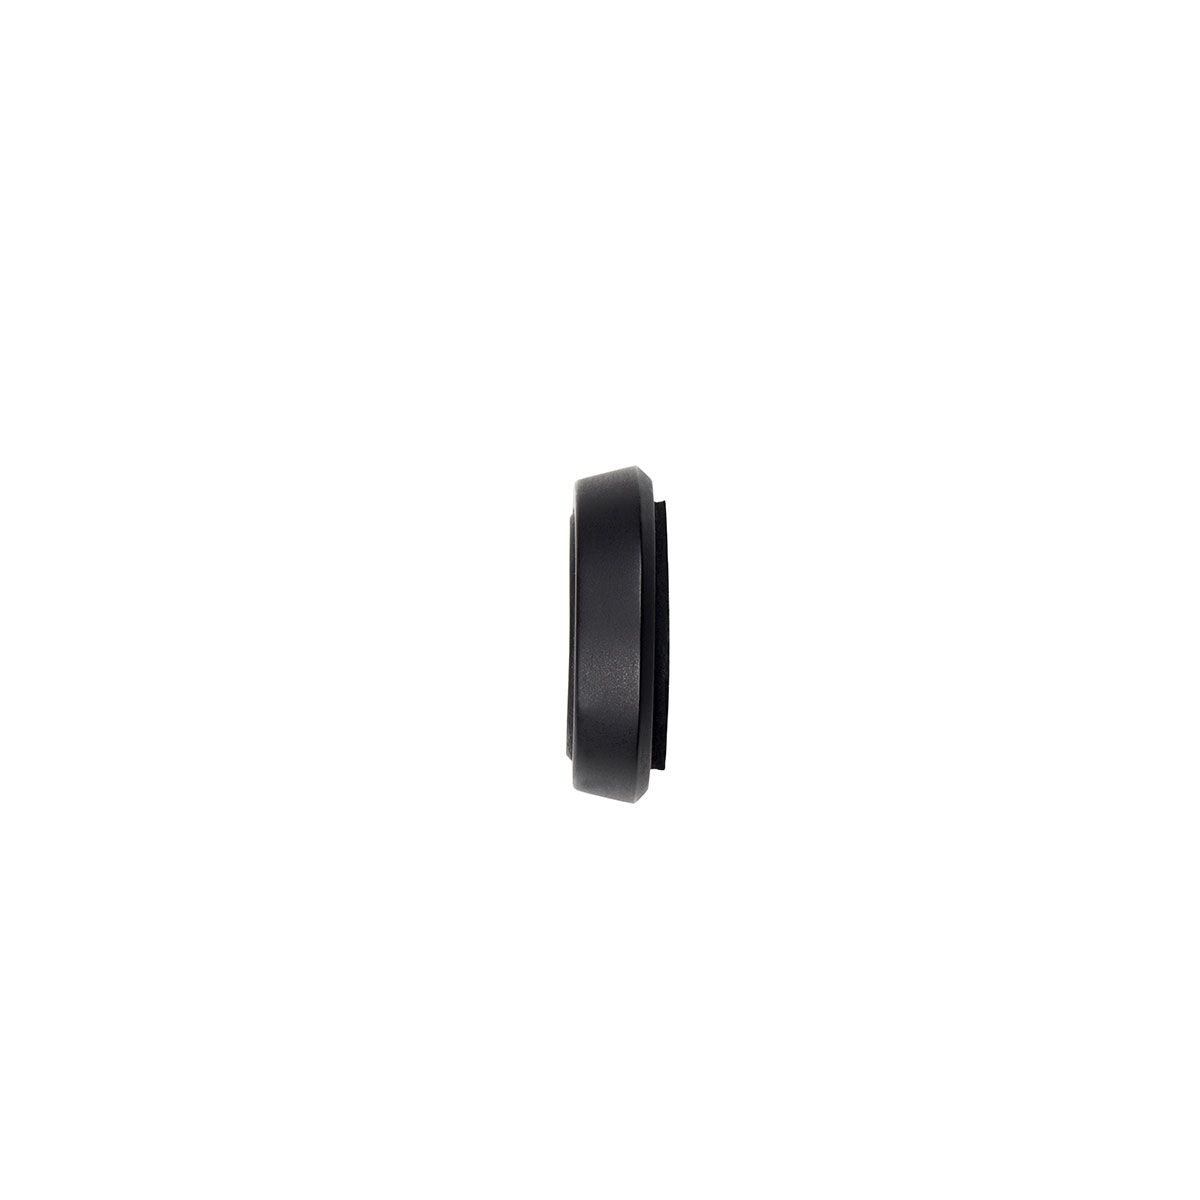 Knomo MAG:MOUNT iPhone Magnet Mount Black